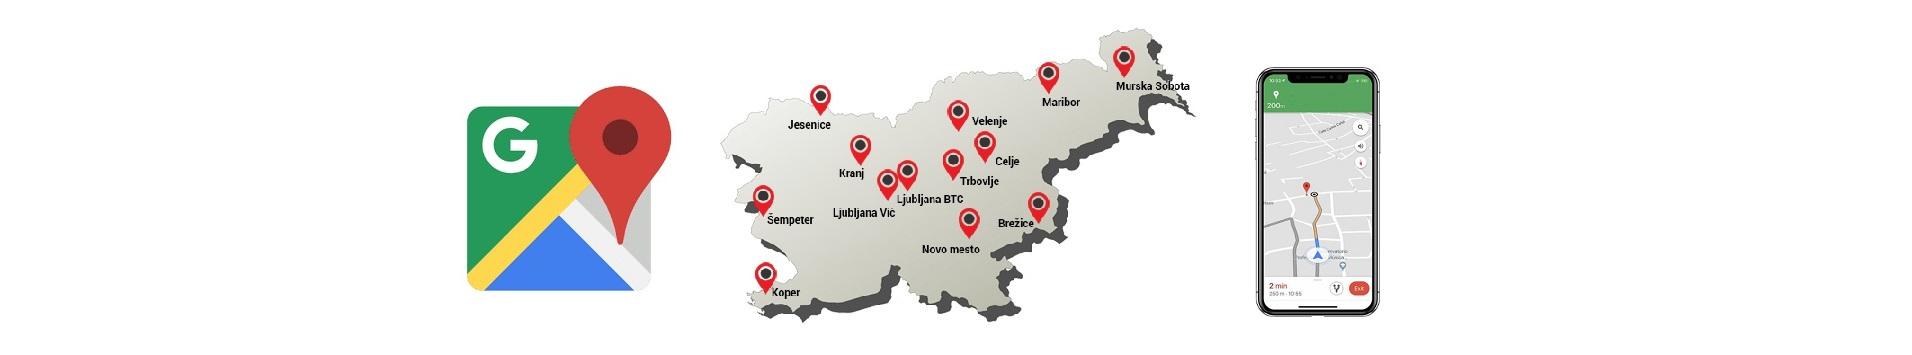 Slusni-centri-audio-bm-slovenija-google-navigacija-navodila-za-pot-do-boljsega-sluha-vodenje